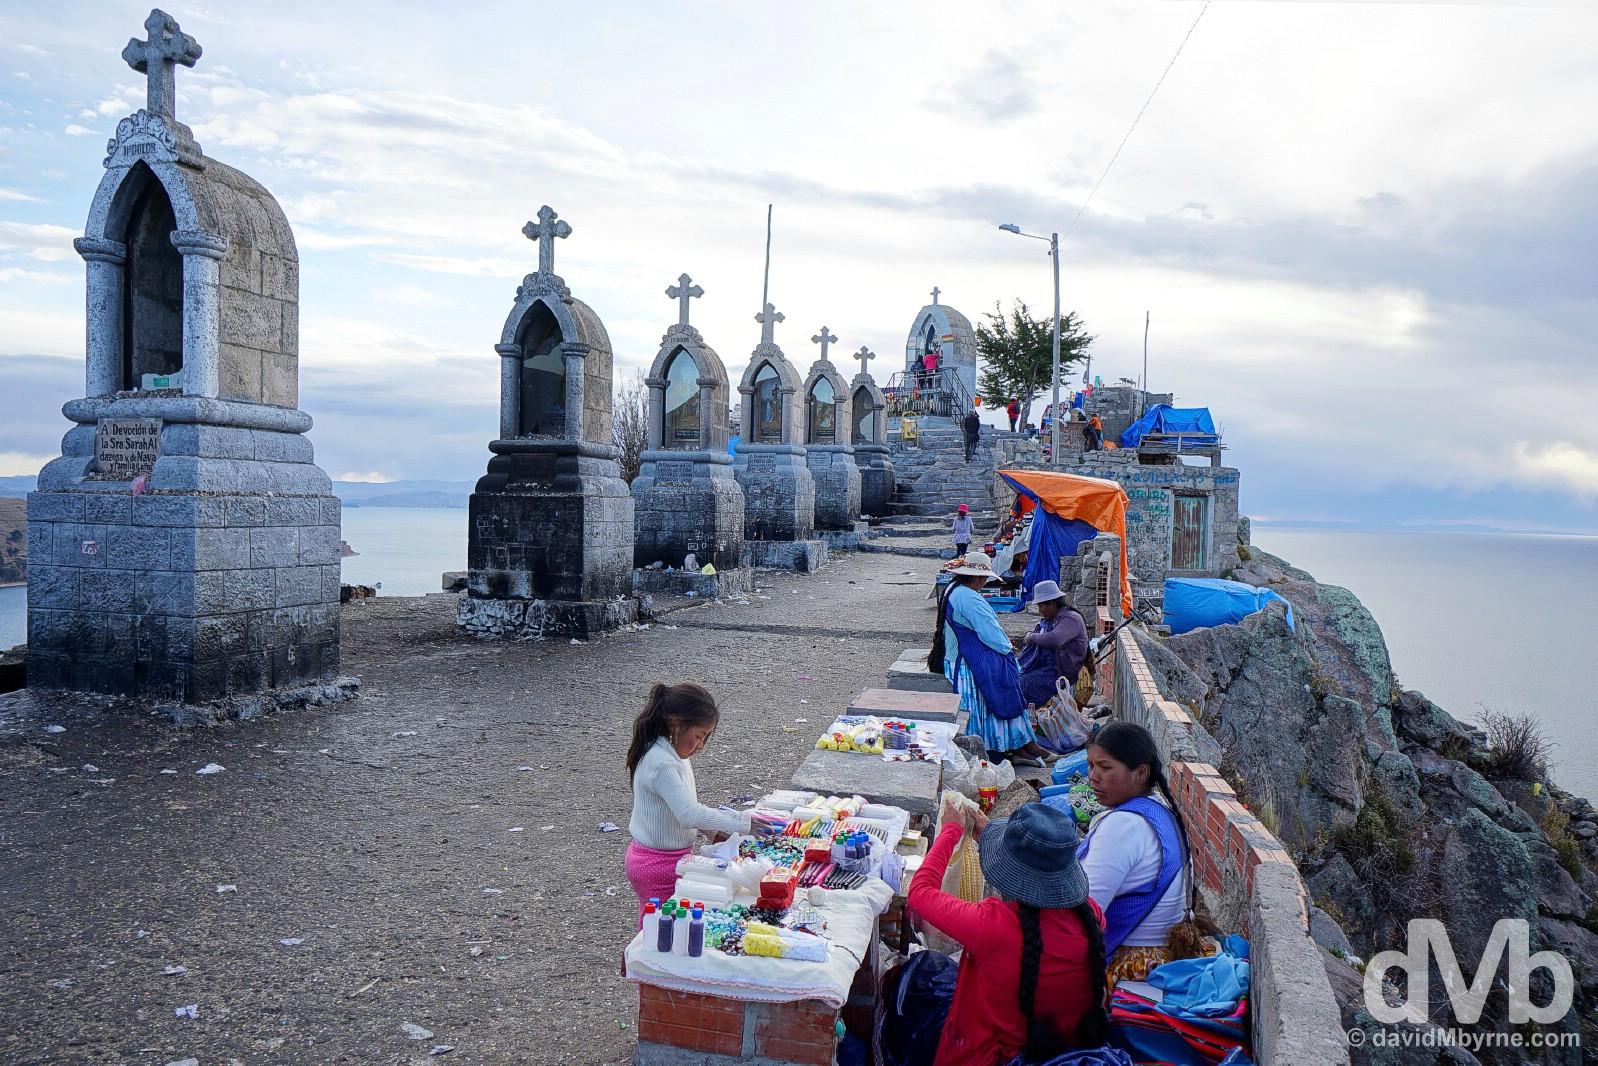 The summit of Cerro Calvario overlooking Lake Titicaca & the town of Copacabana, Bolivia. August 23, 2015.